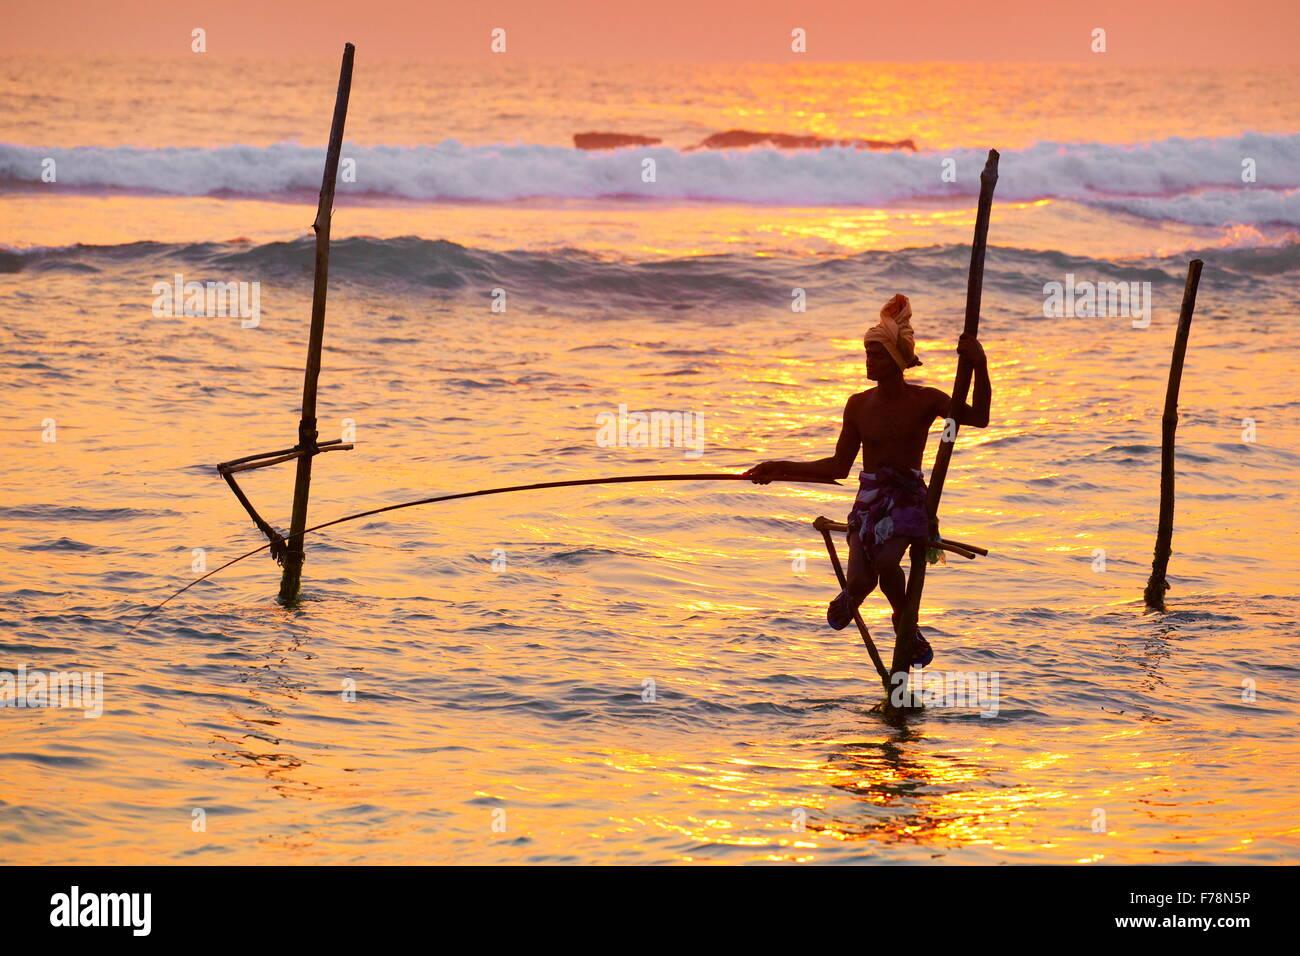 Tropical sea landscape with stilt fisherman at sunset time, Koggala Beach, Sri Lanka, Asia - Stock Image